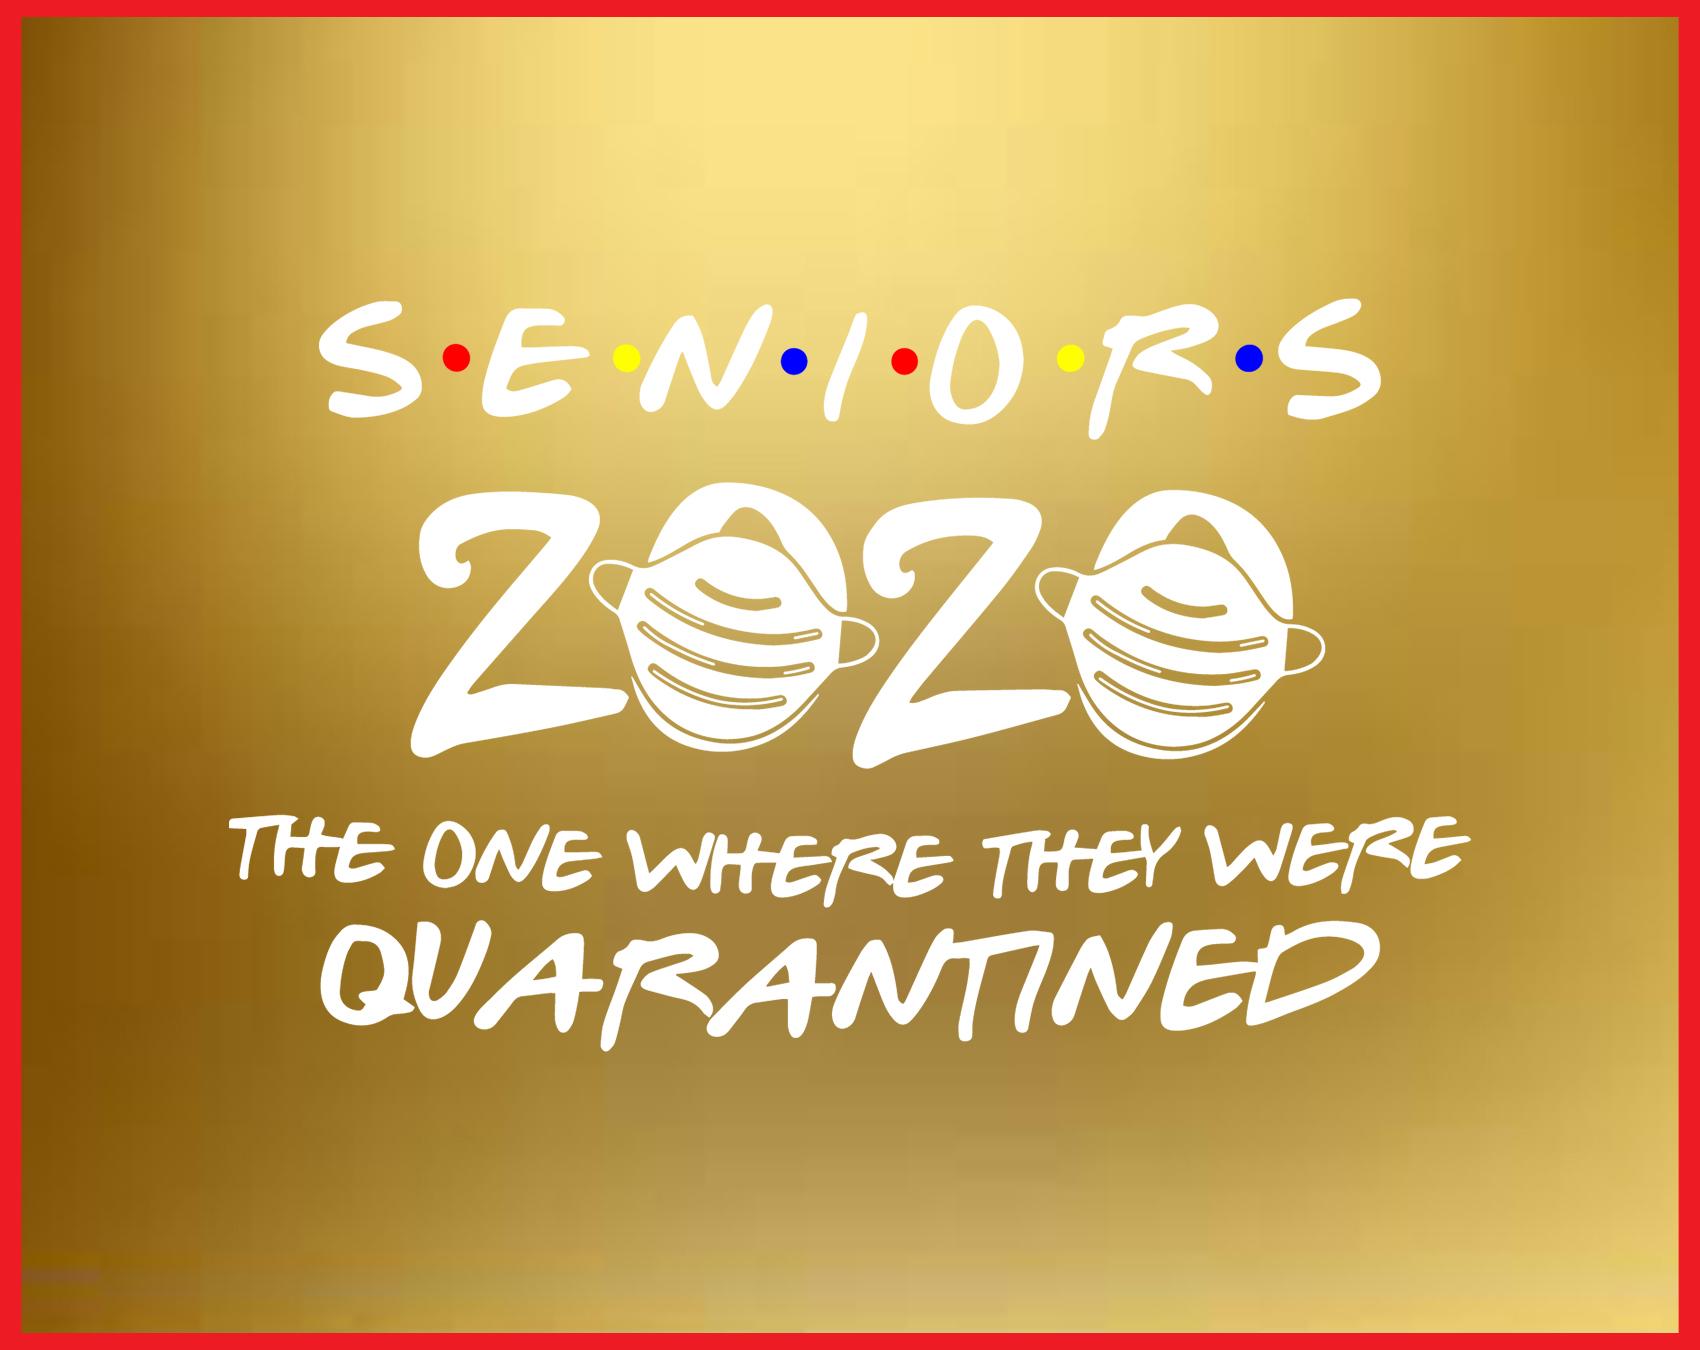 Corona Svg Senior 2020 Quarantine Corona Svg Senior 2020 Quarantine Corona Svg Straight Outta Quarantine Svg Corona Svg Quarantine Svg Customer Satisfaction Is Our Priority